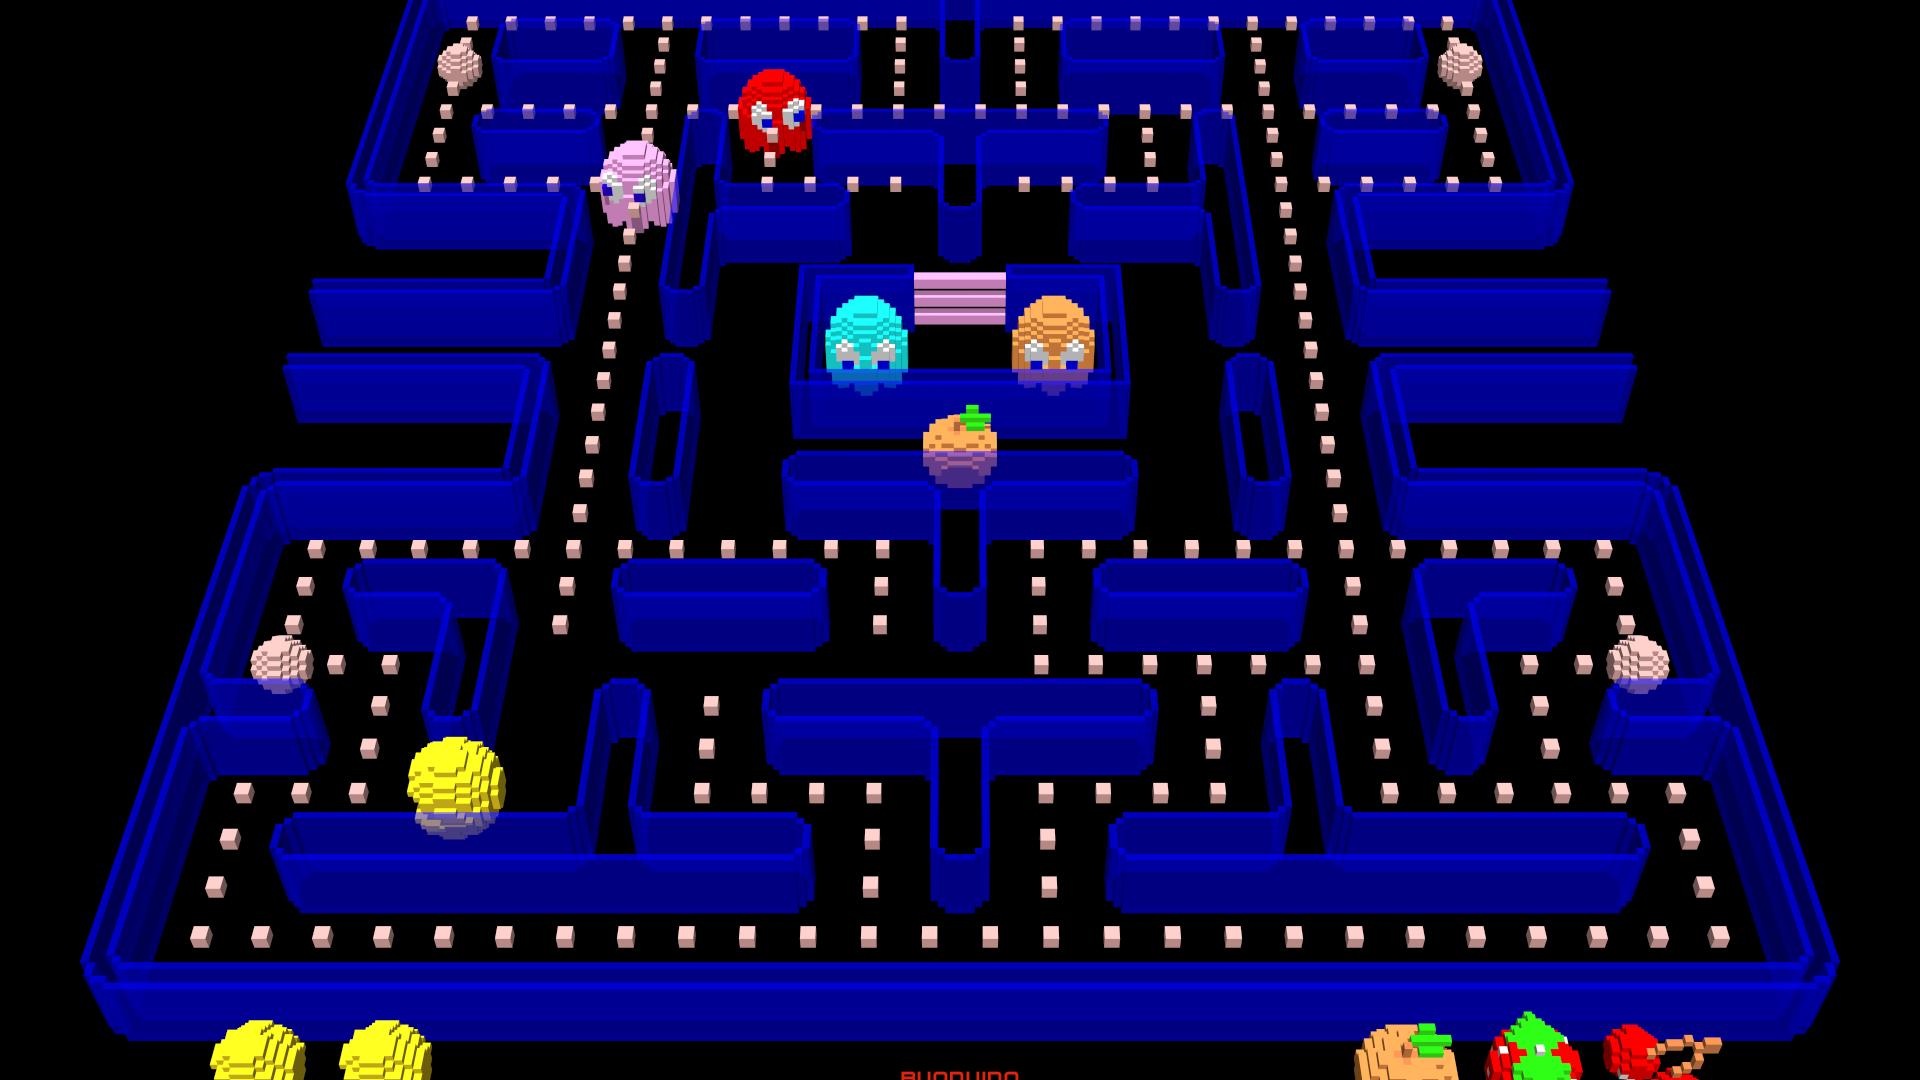 Free download Pacman Maze Wallpaper Pacman by nes still